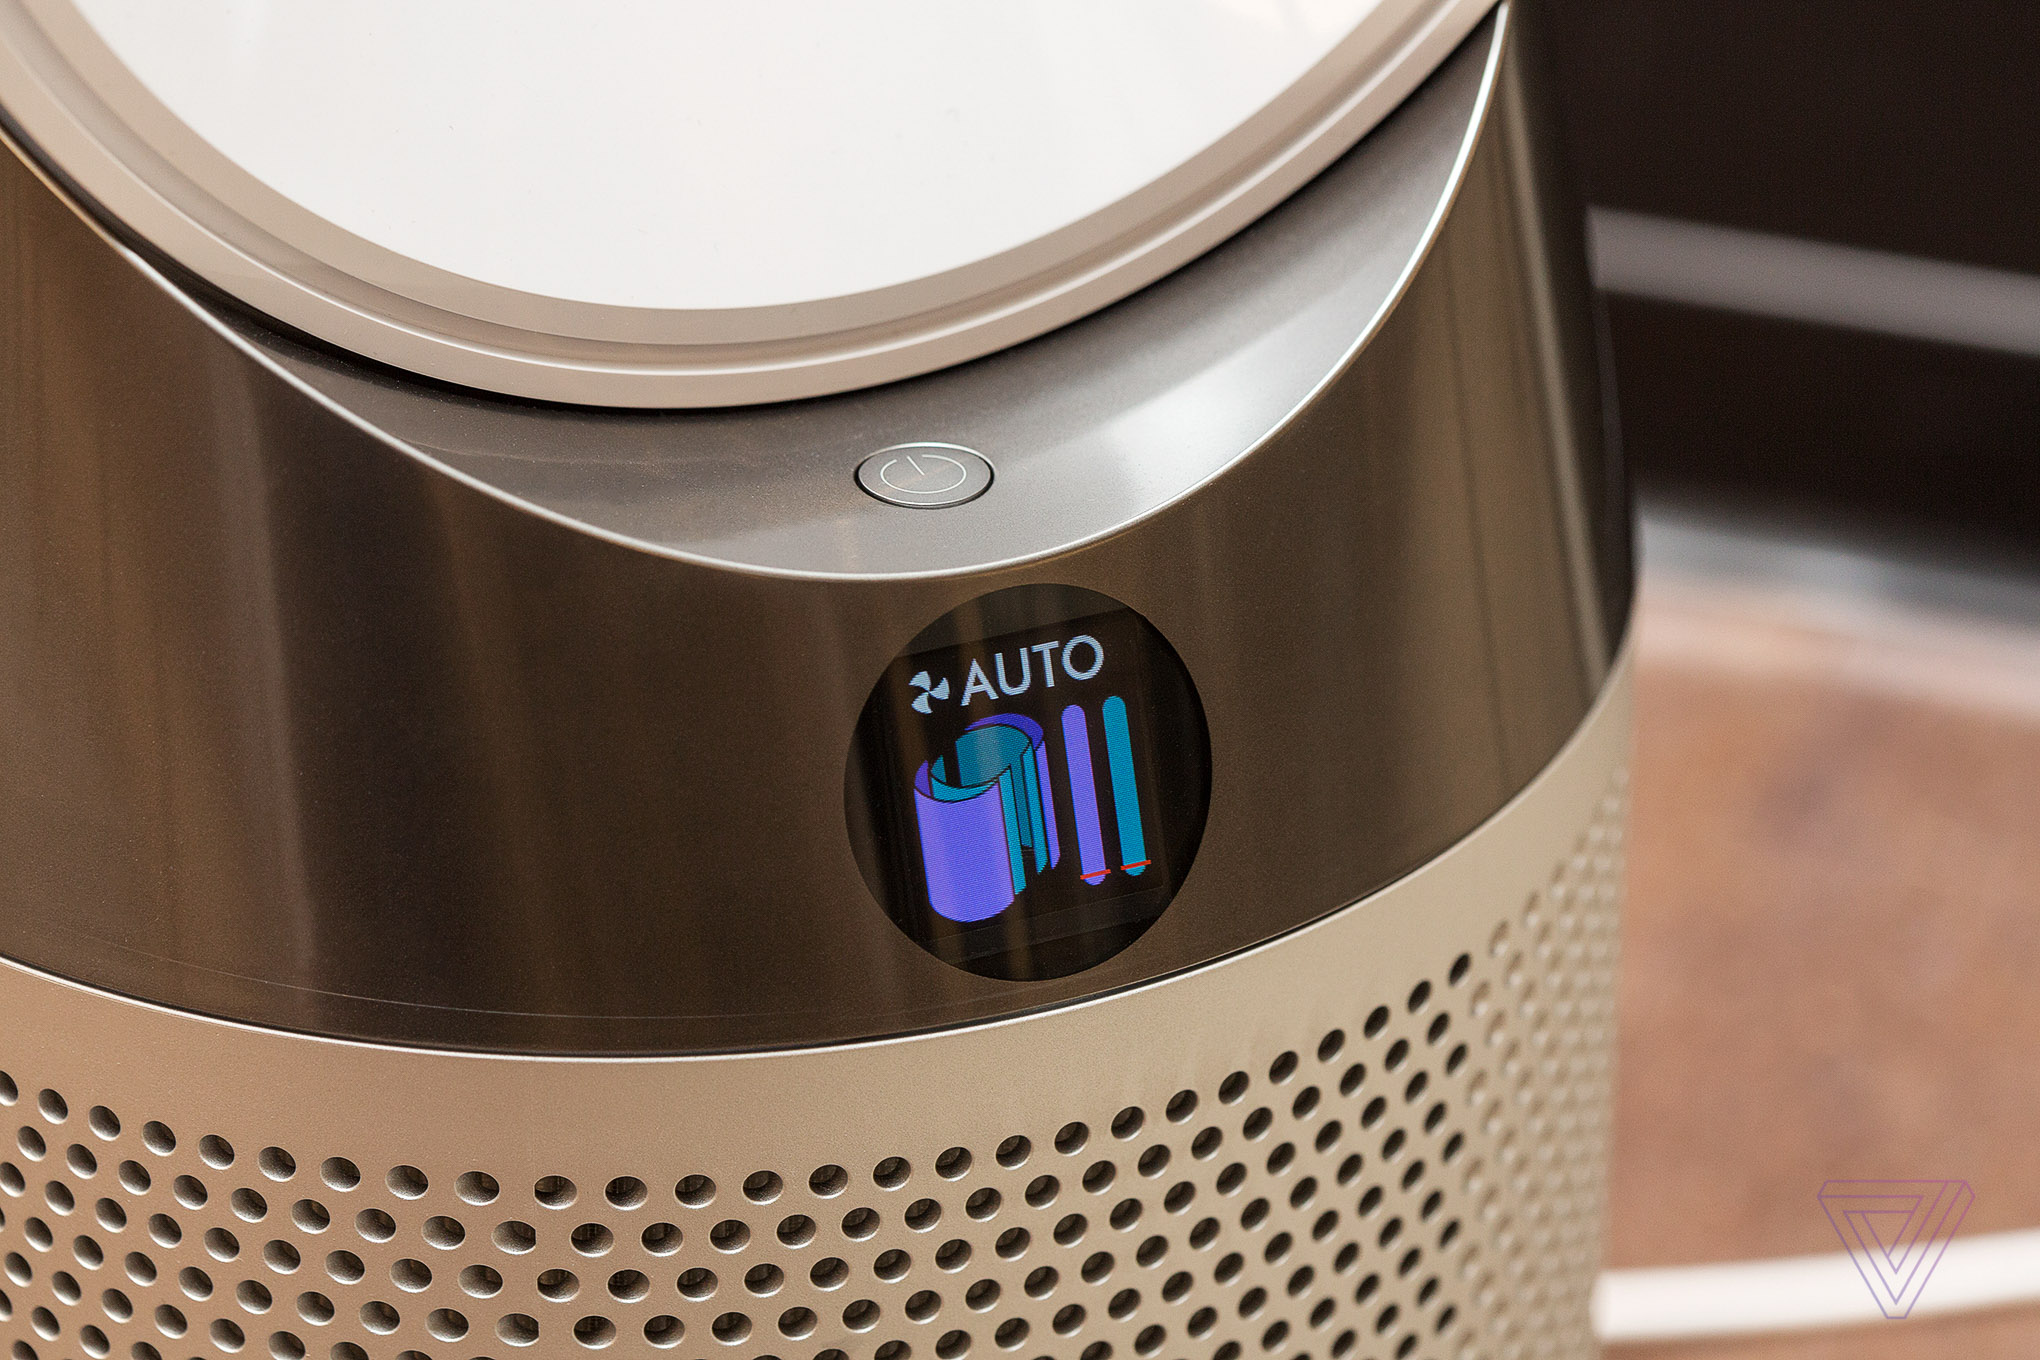 Dyson's new air purifier has an LCD screen that tells you